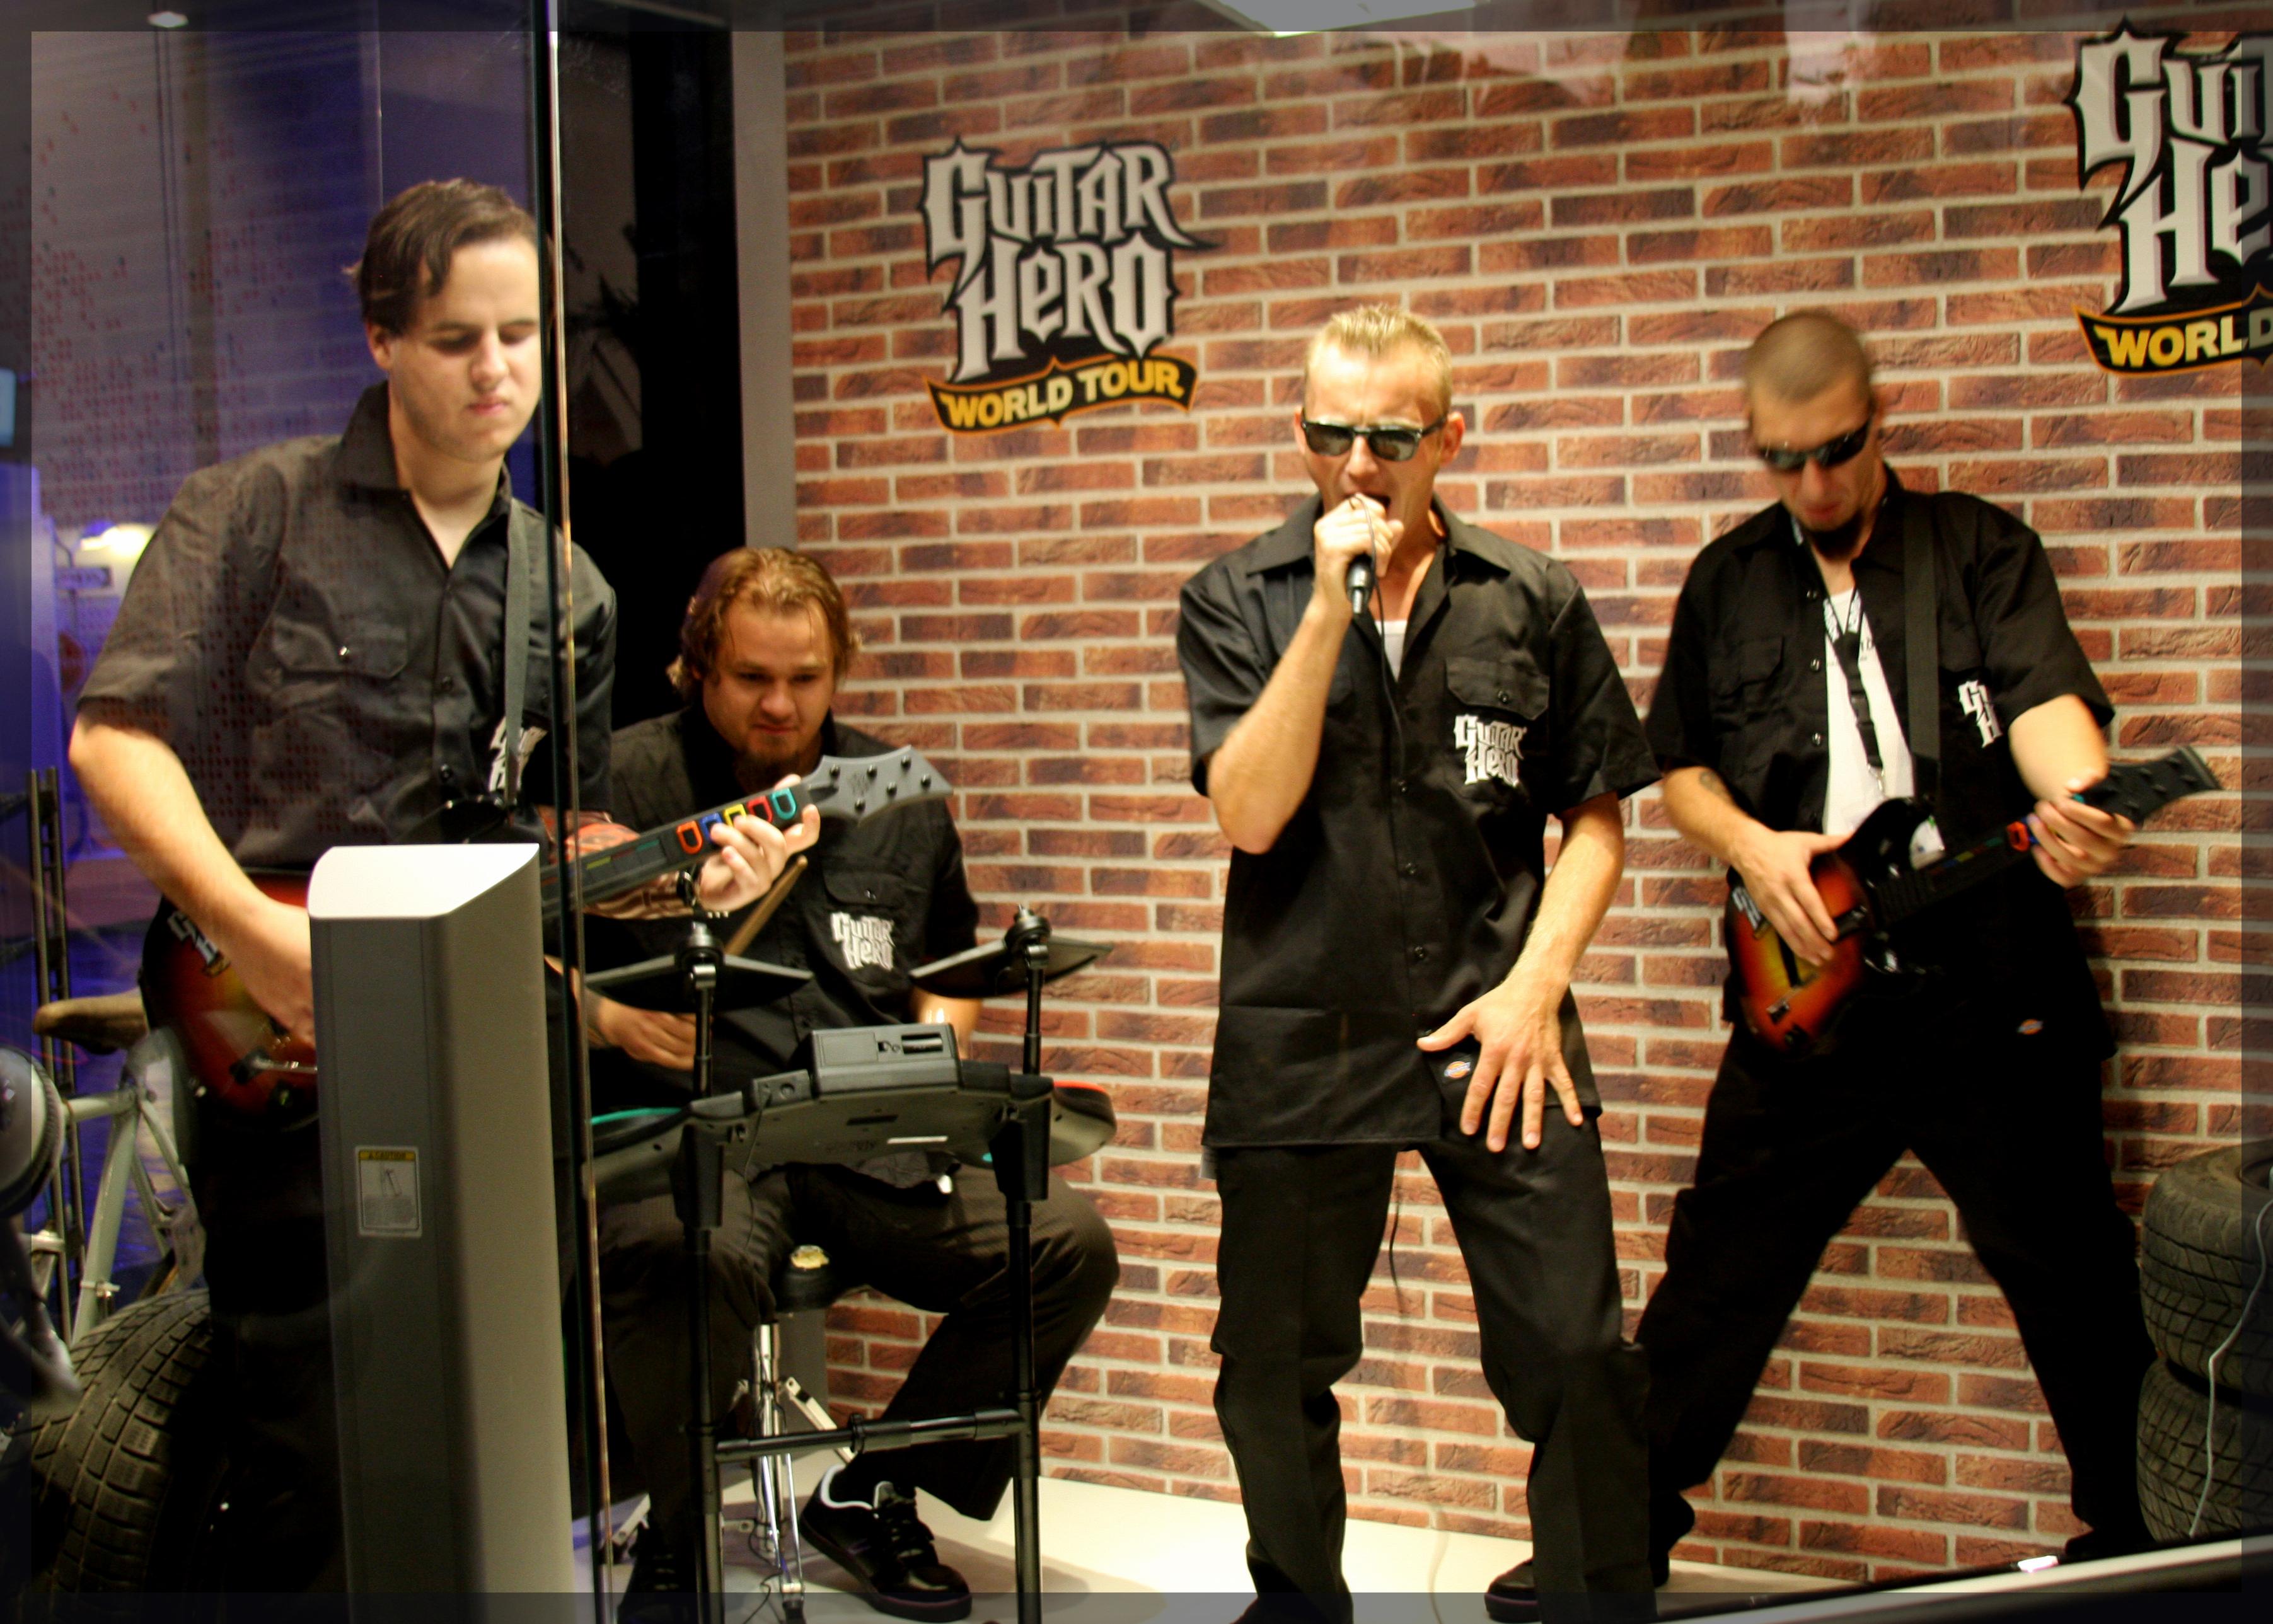 Guitar hero (megapost) Guitar_Hero_World_Tour-players